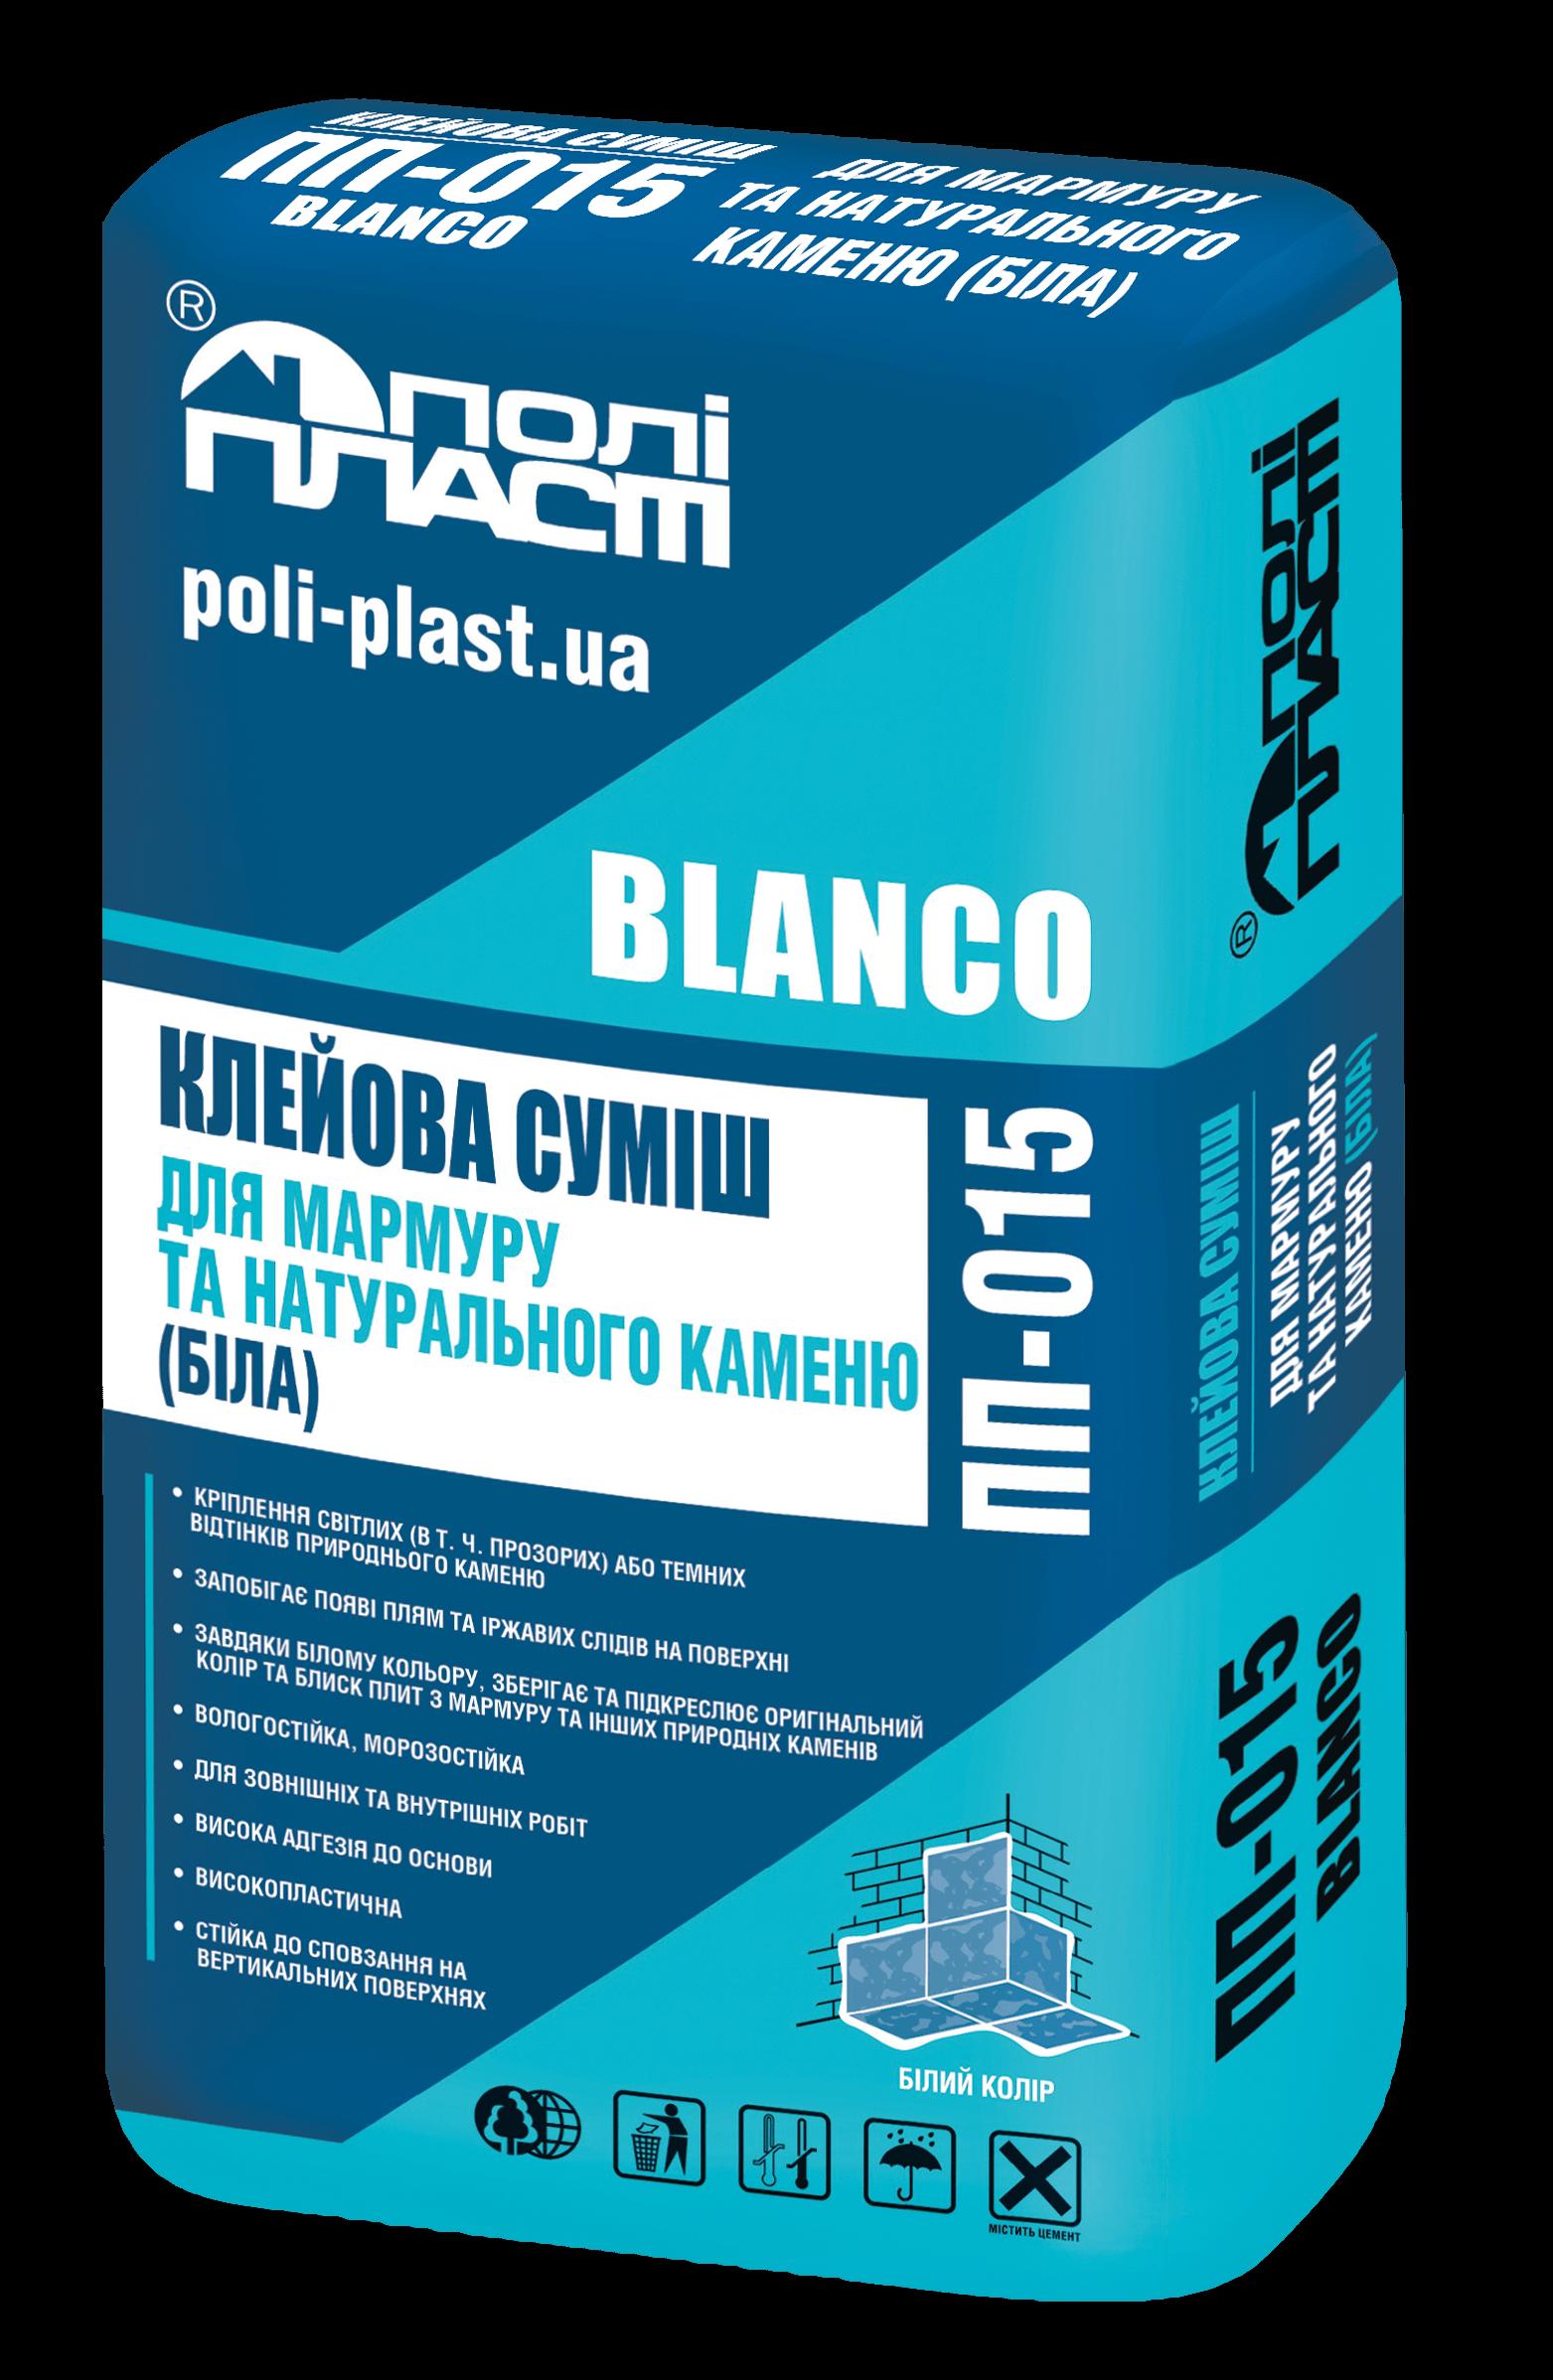 ПП-015 BLANCO